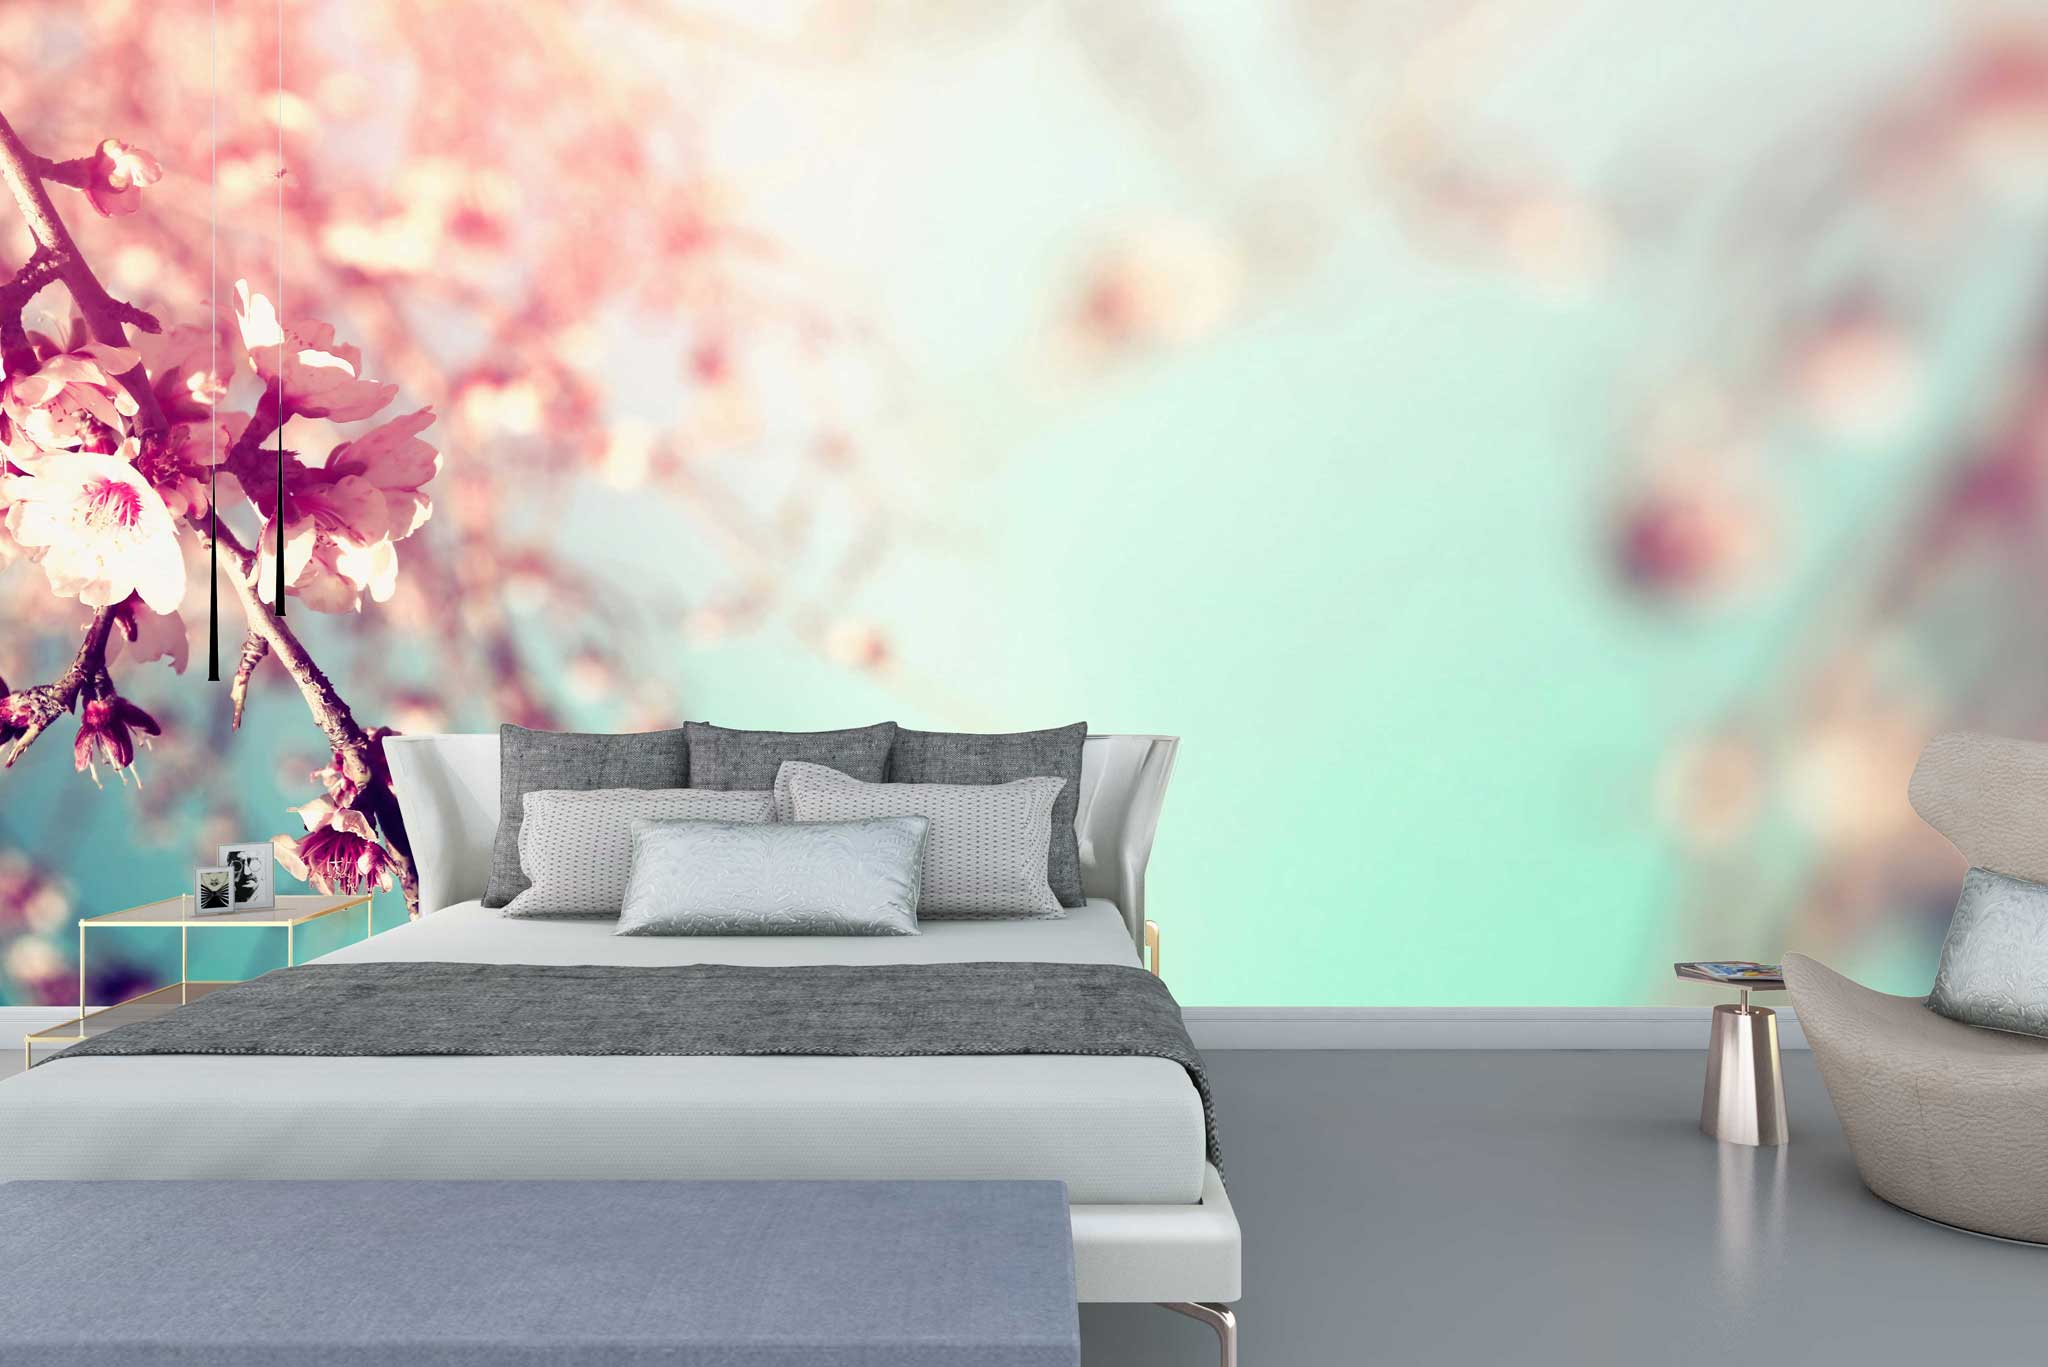 tapet-fototapet-comanda-personalizat-bucuresti-perete-special-lux-model-fotografie-crengi-flori-cires-roz